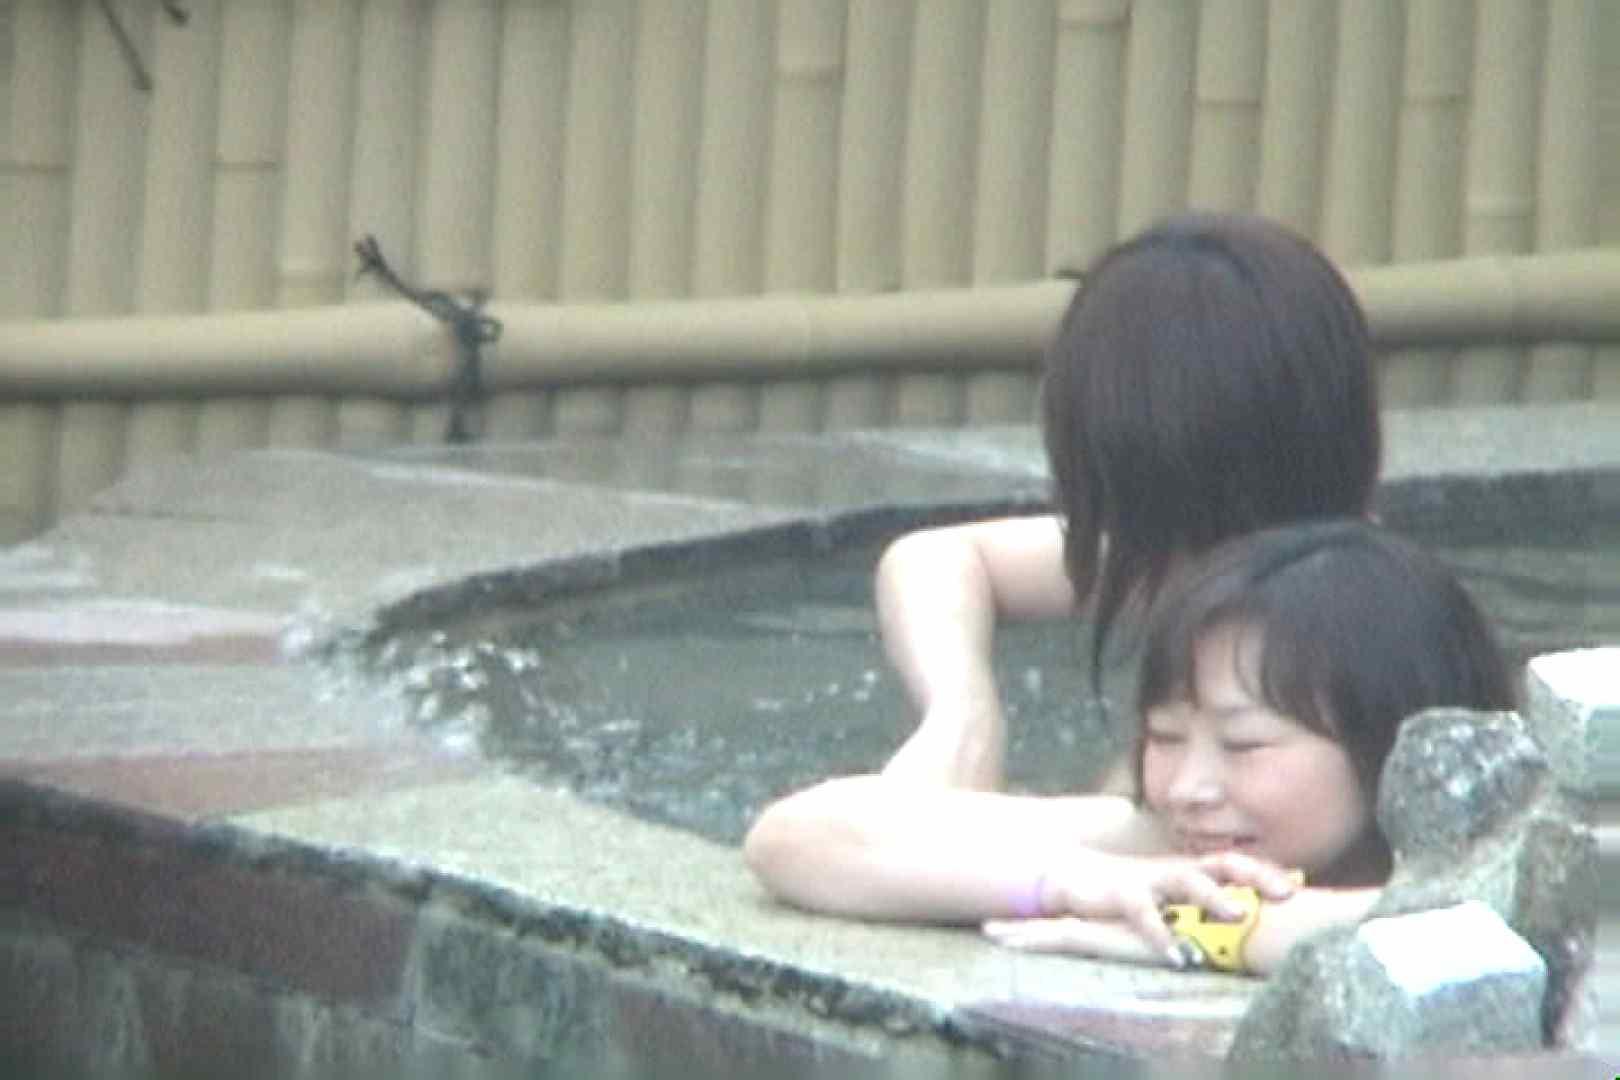 Aquaな露天風呂Vol.58【VIP限定】 盗撮   OLセックス  89画像 7